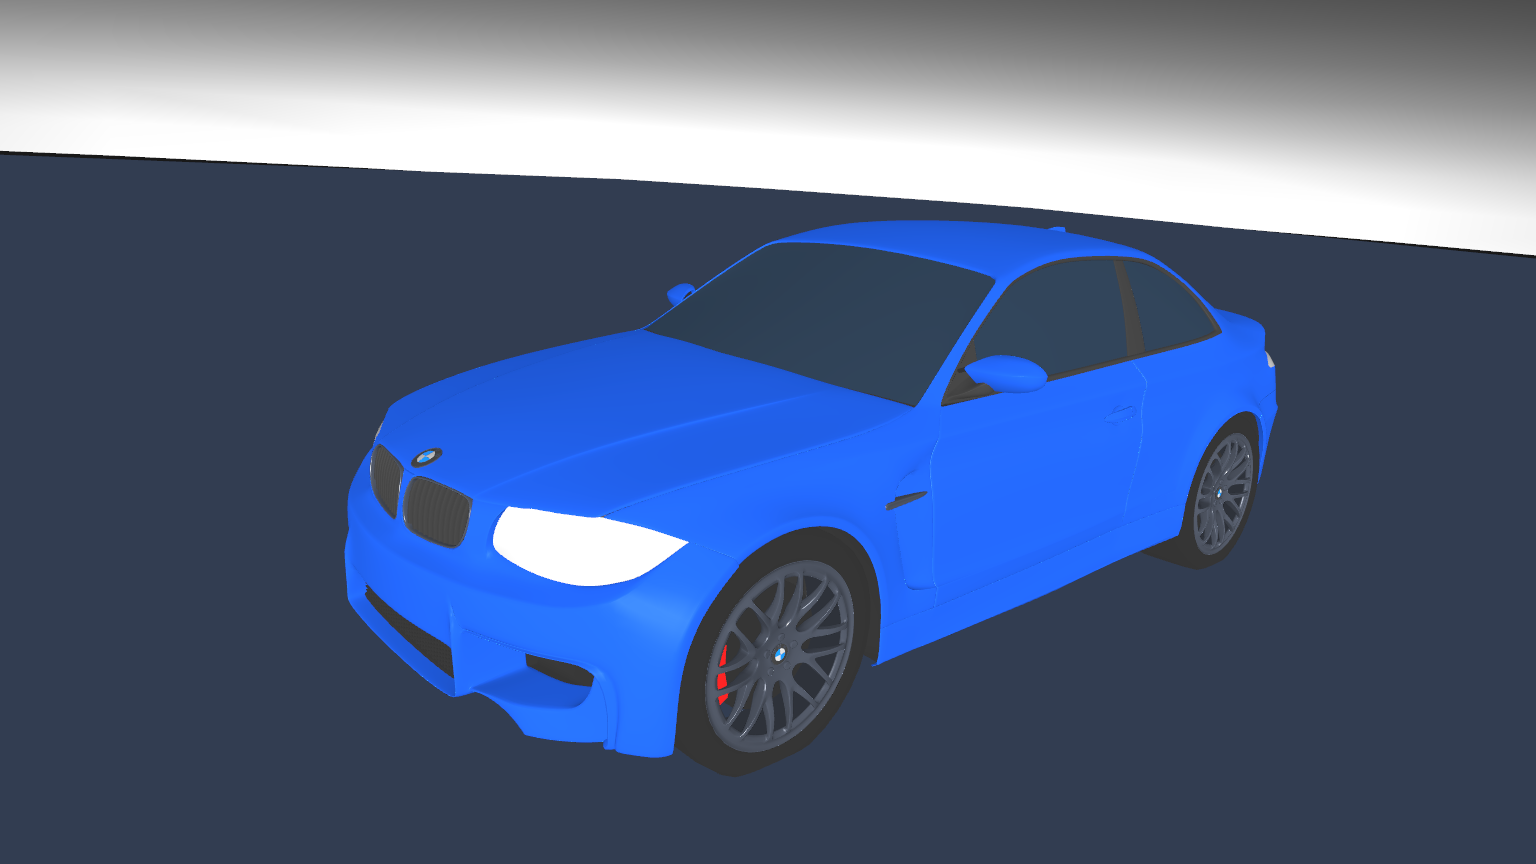 ASTC texture compression, progress of engine Delphi